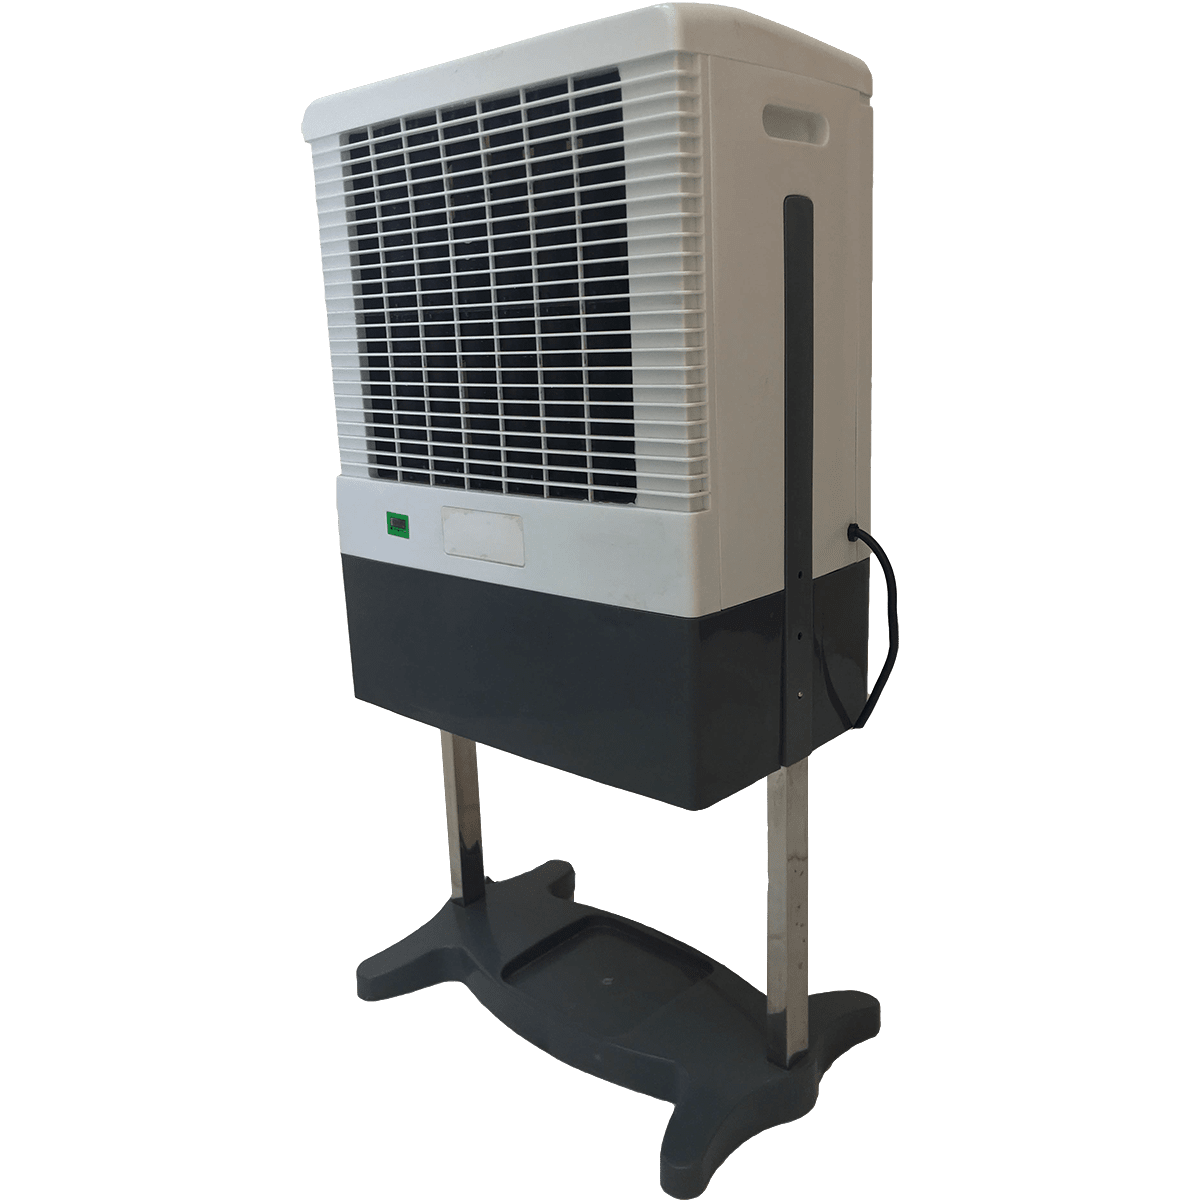 Arizona Koolkube Evaporative Cooler (az18ma)